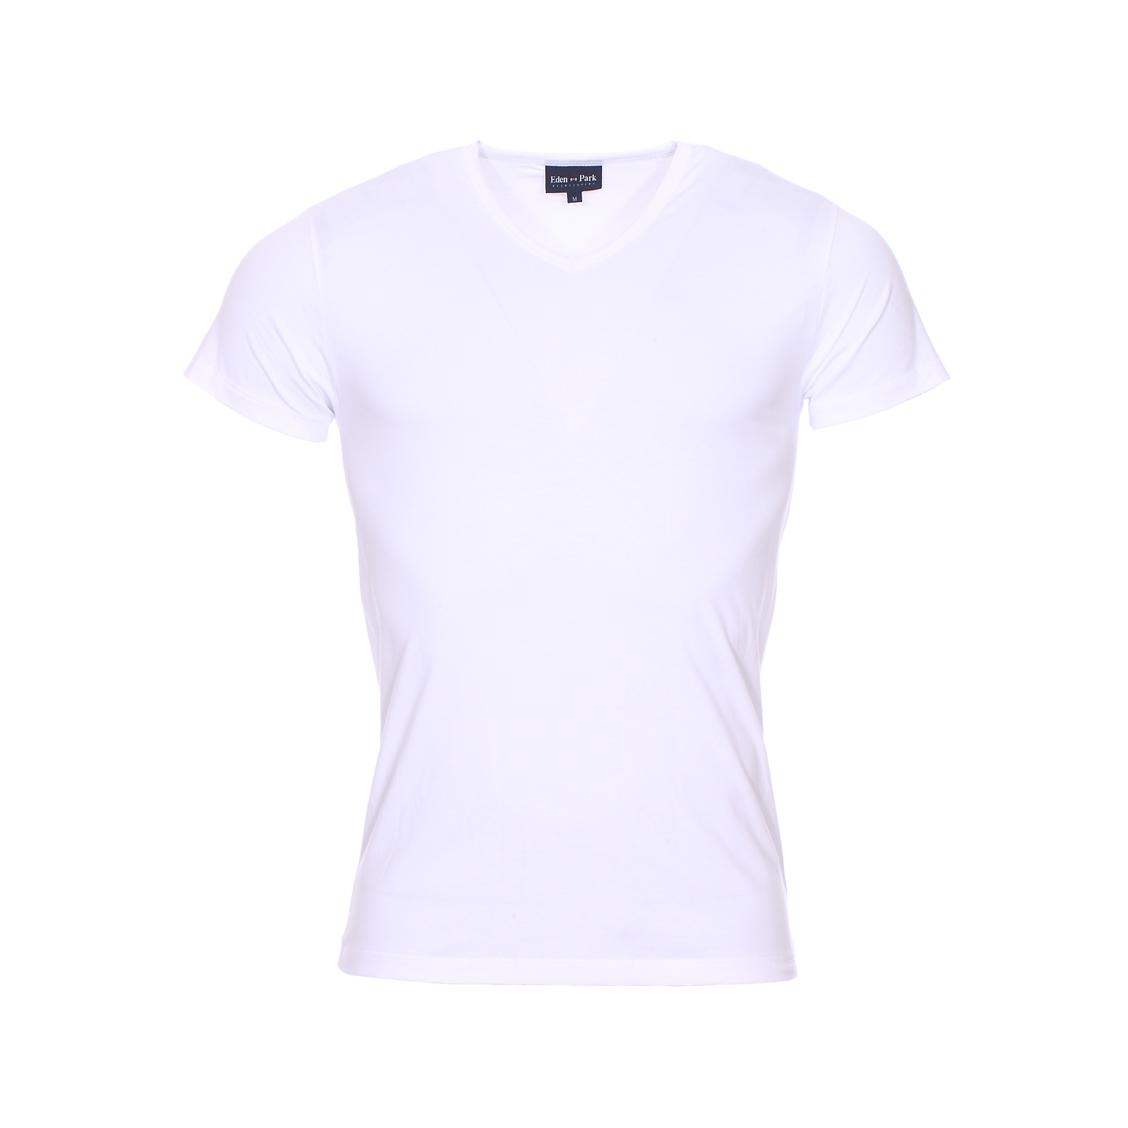 Tee-shirt col v eden park en coton stretch blanc